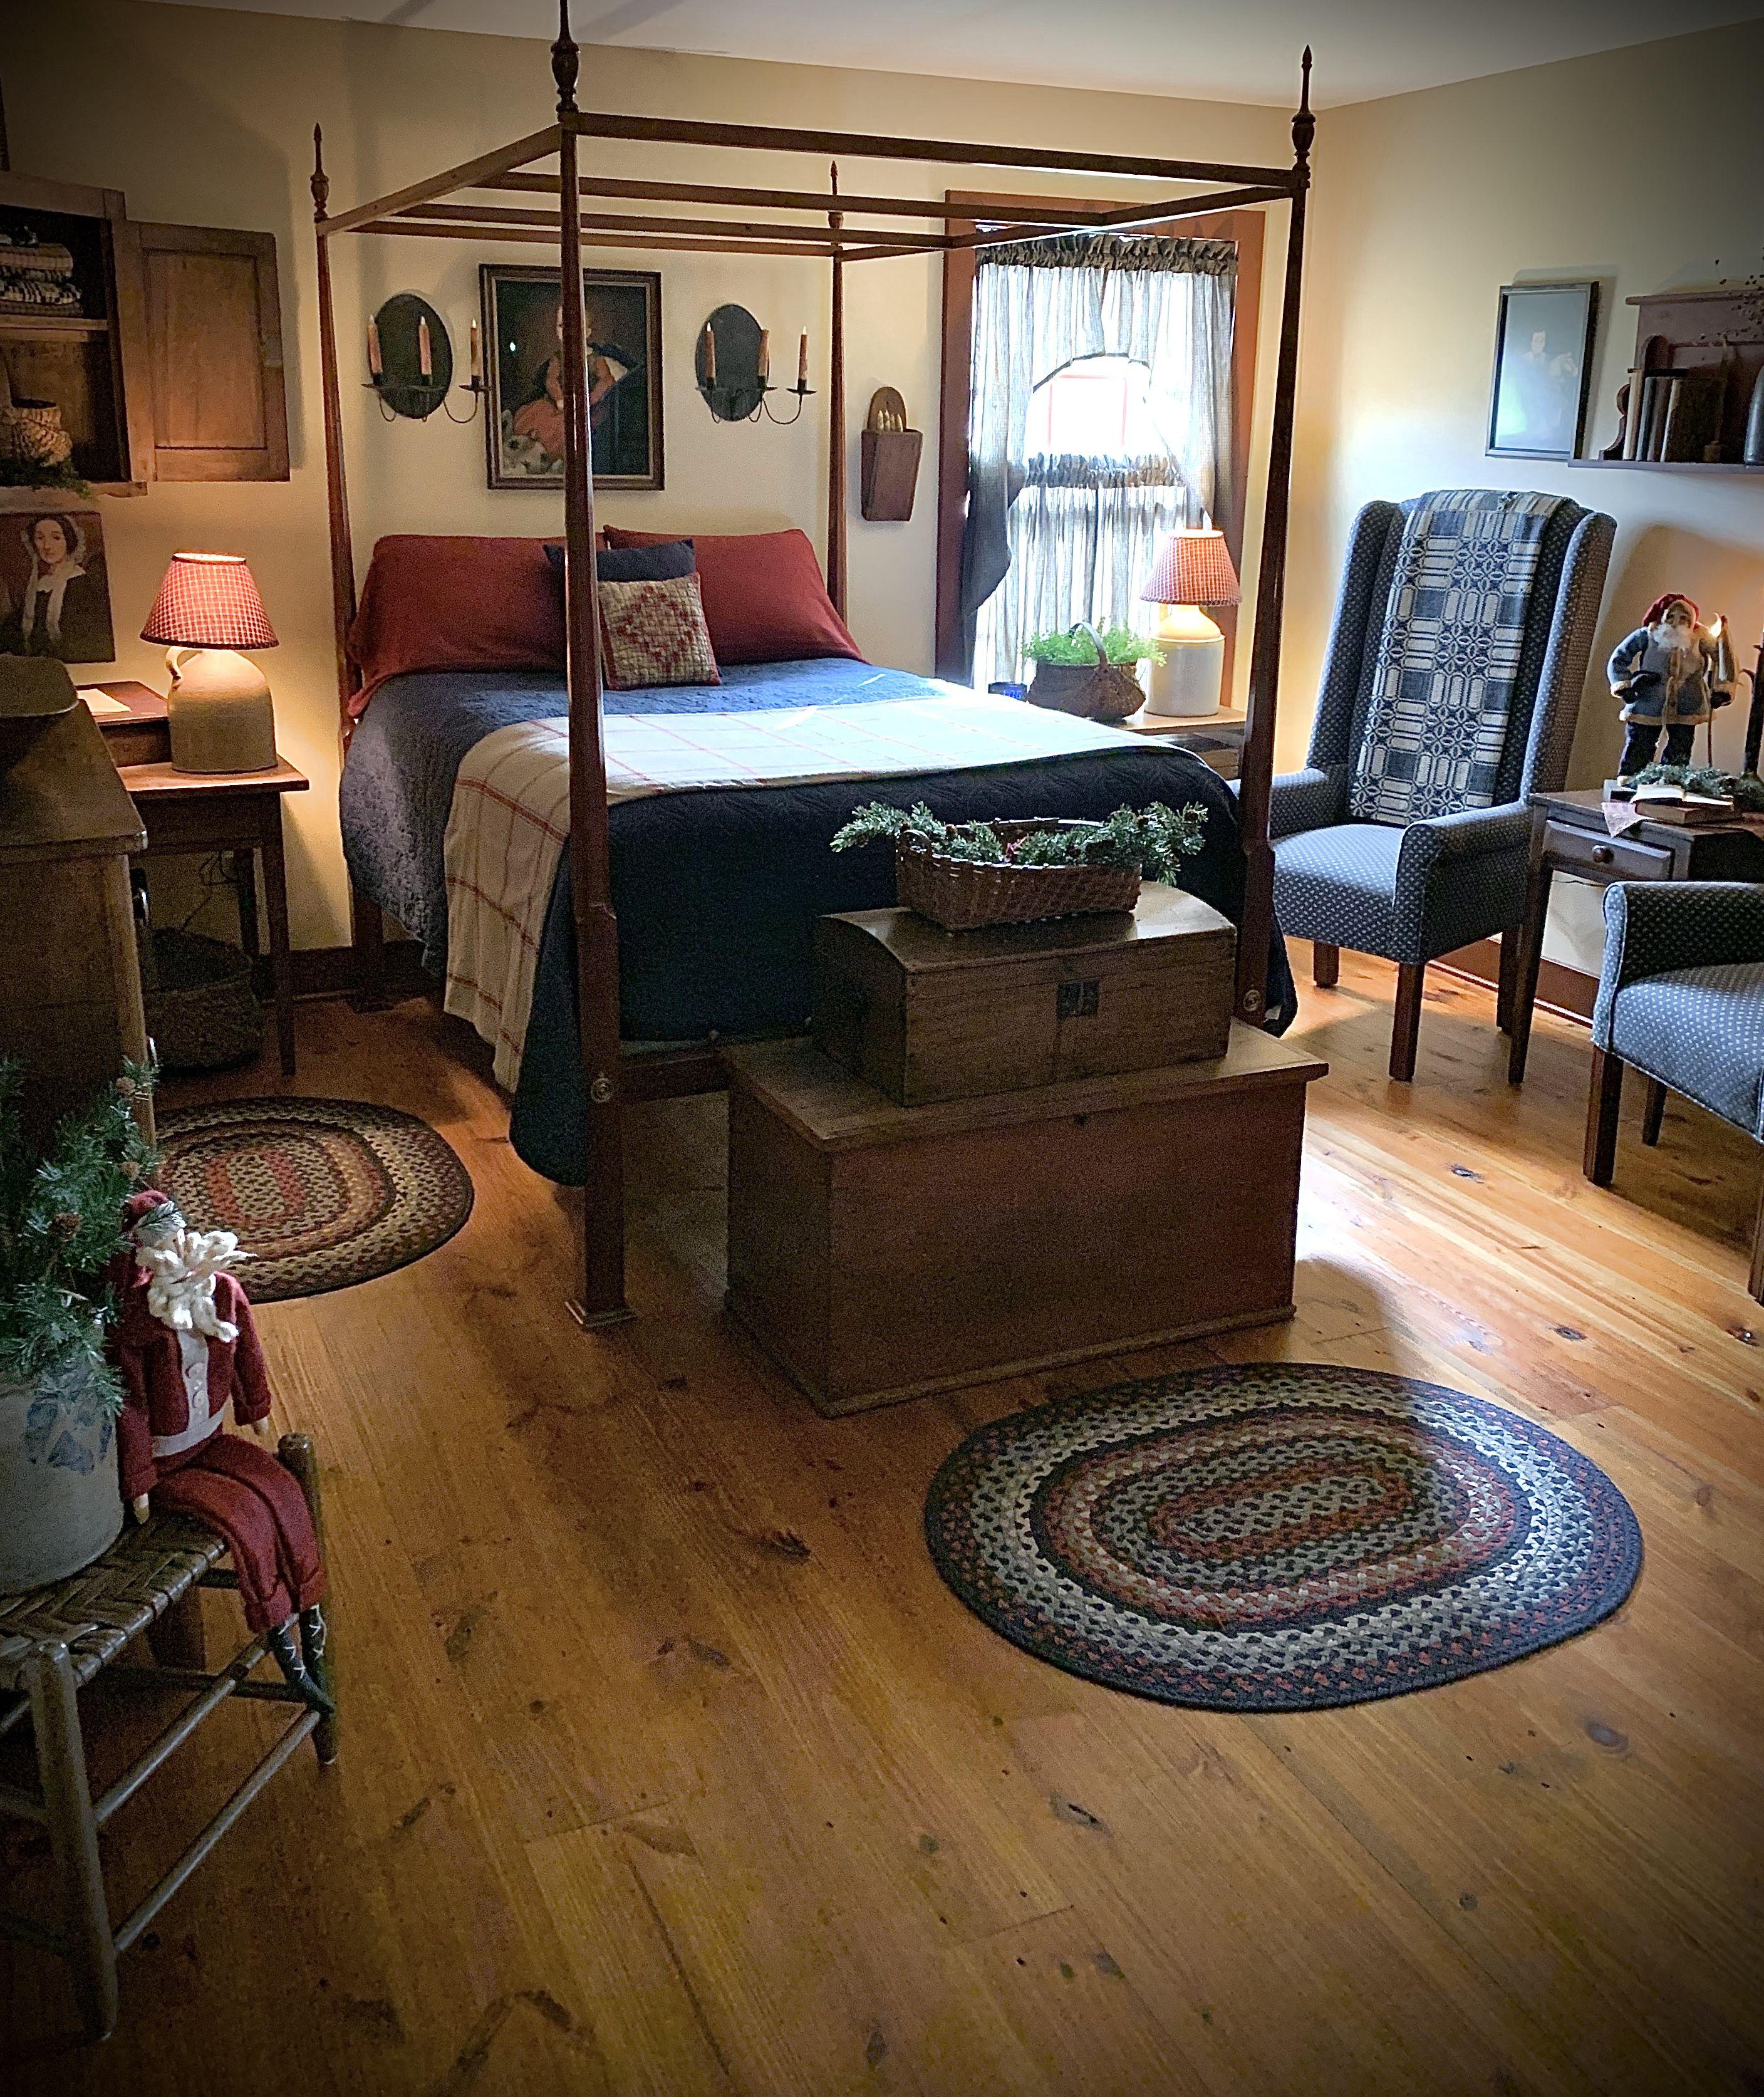 33+ Primitive master bedroom ideas ppdb 2021